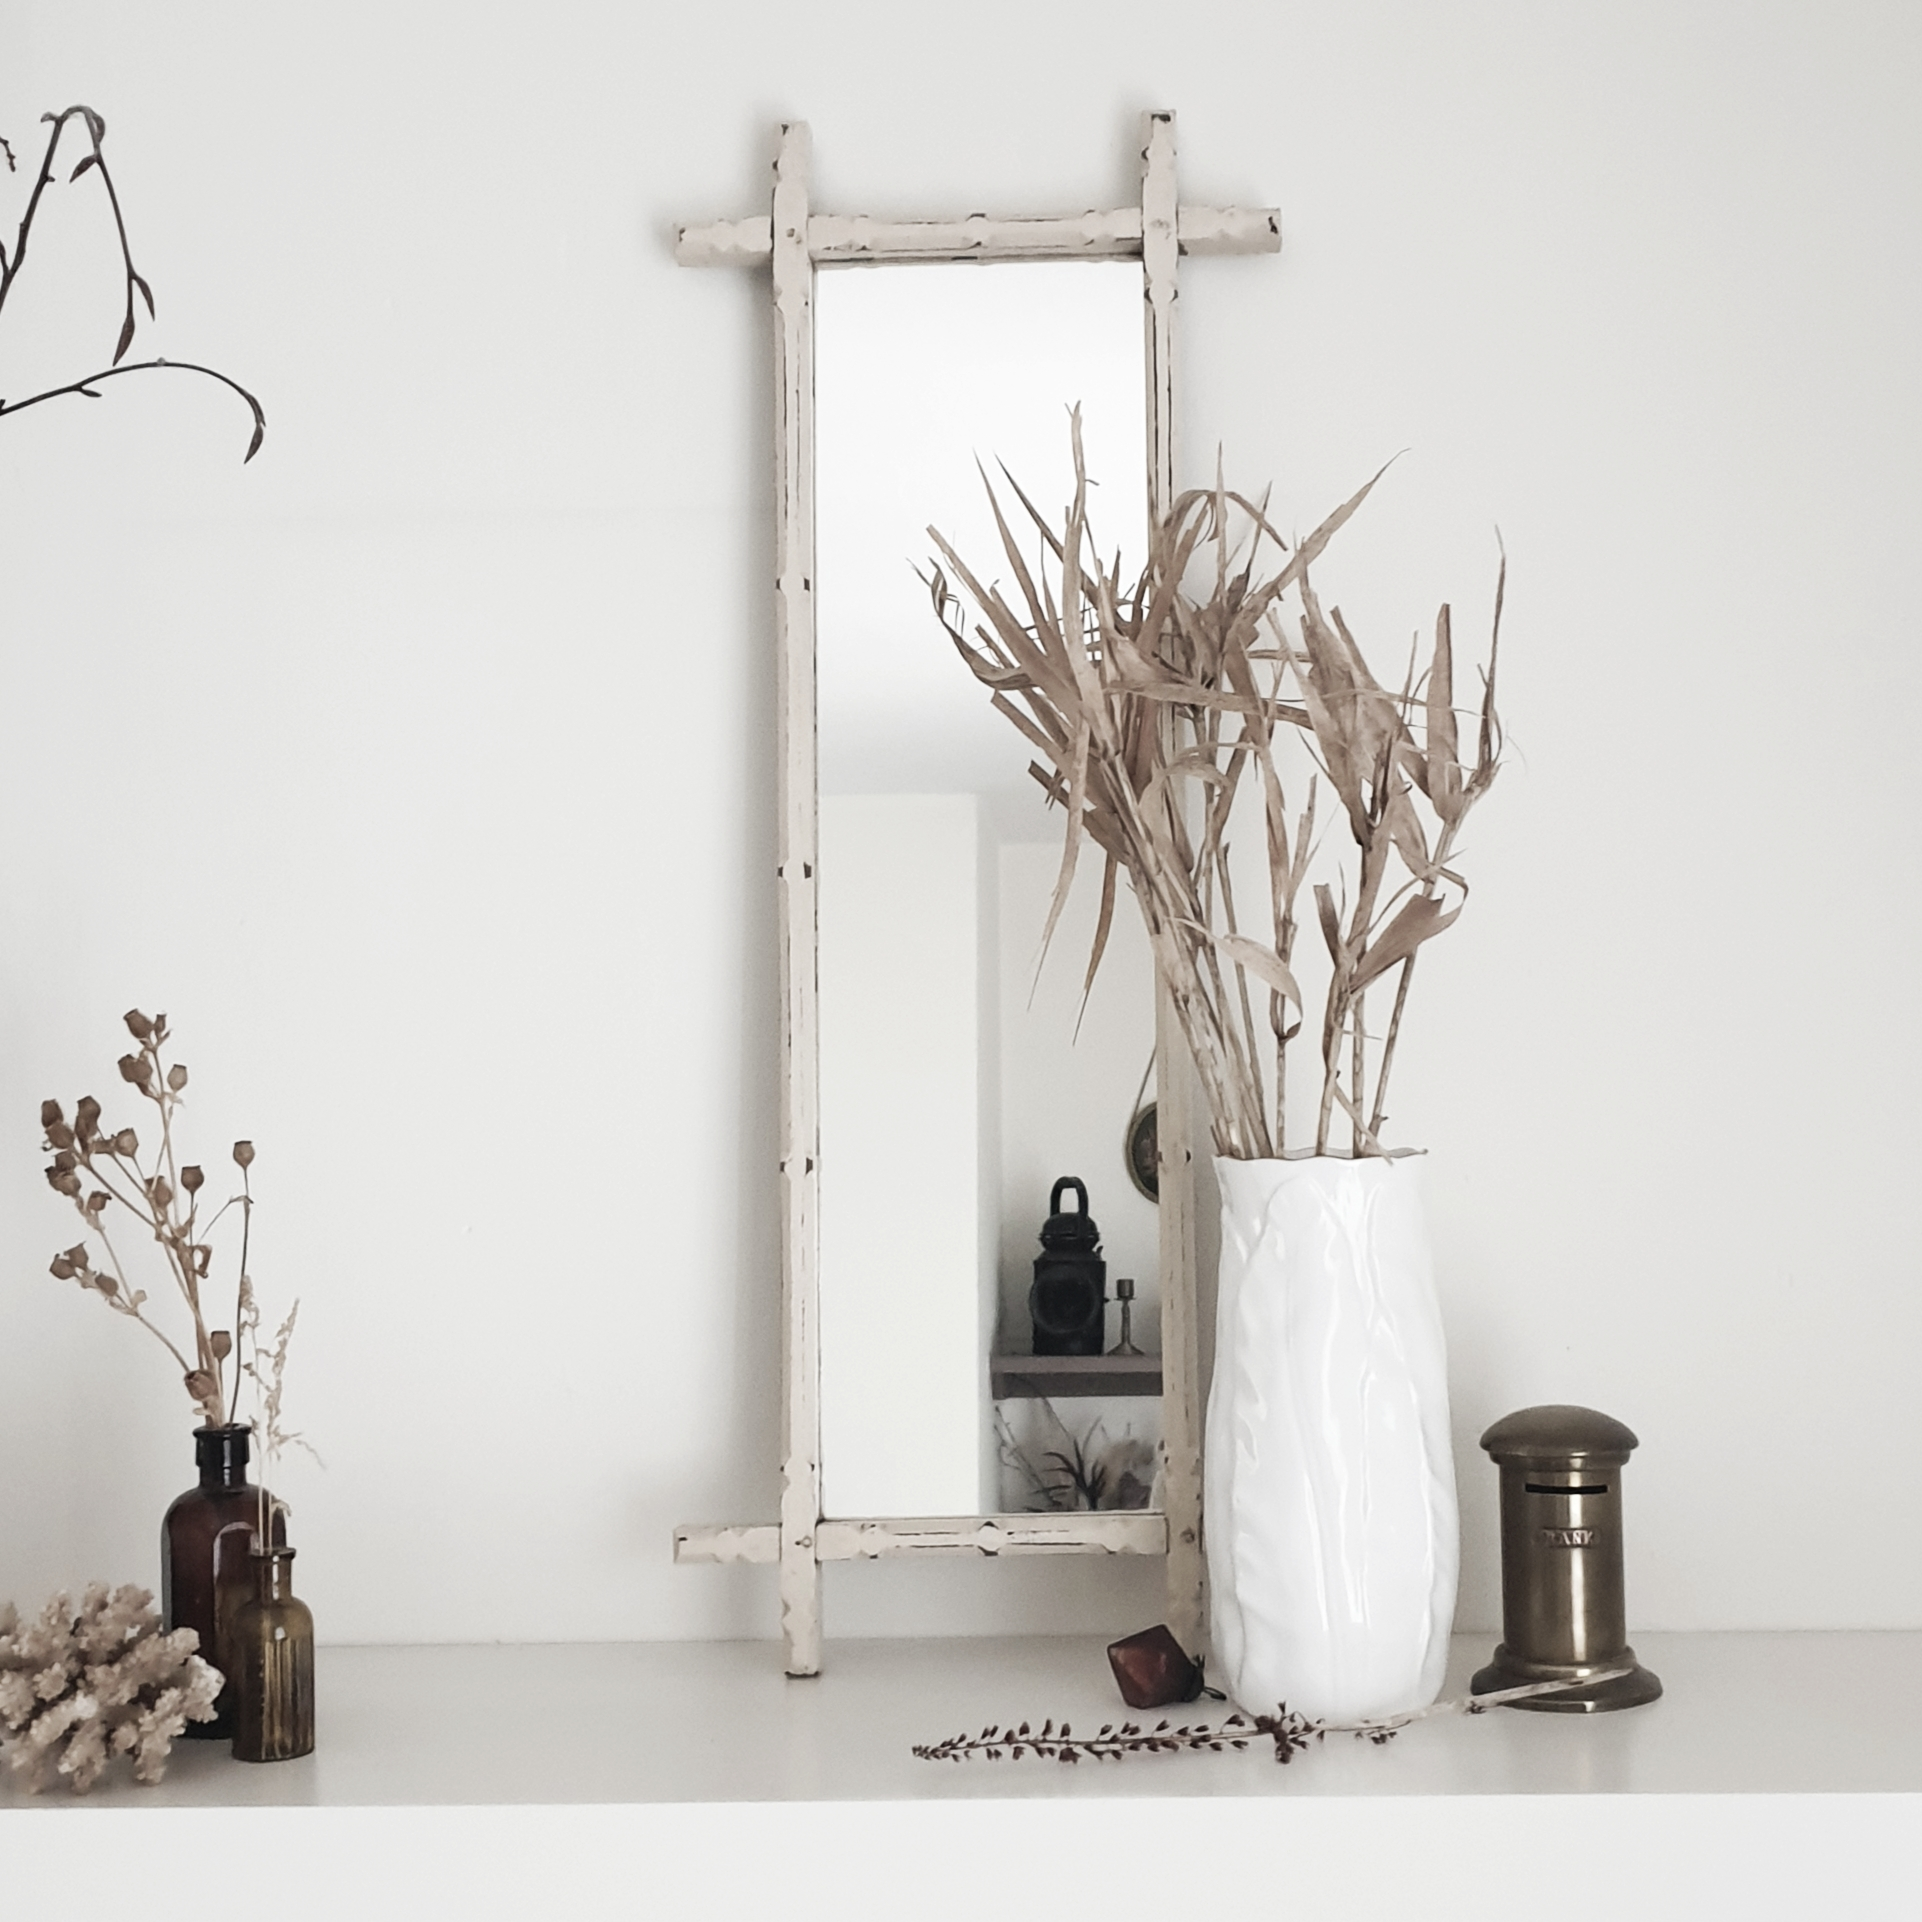 vase & mirror.jpg